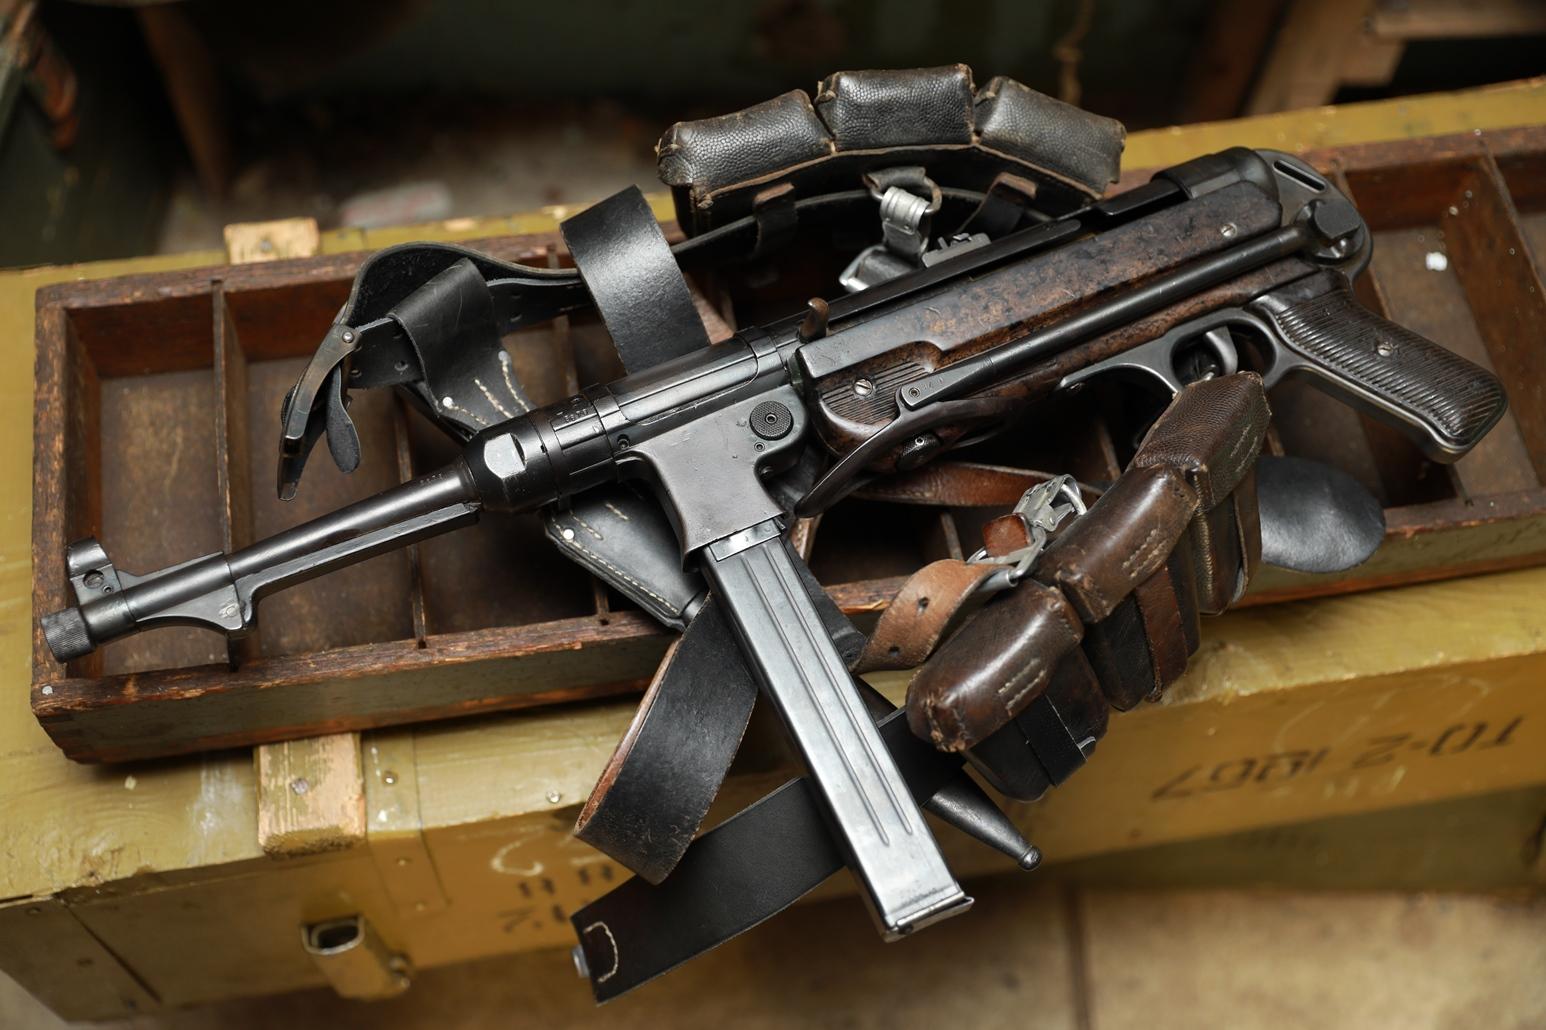 Немецкий пистолет-пулемет M.P. 40 bnz 1942 год #5678